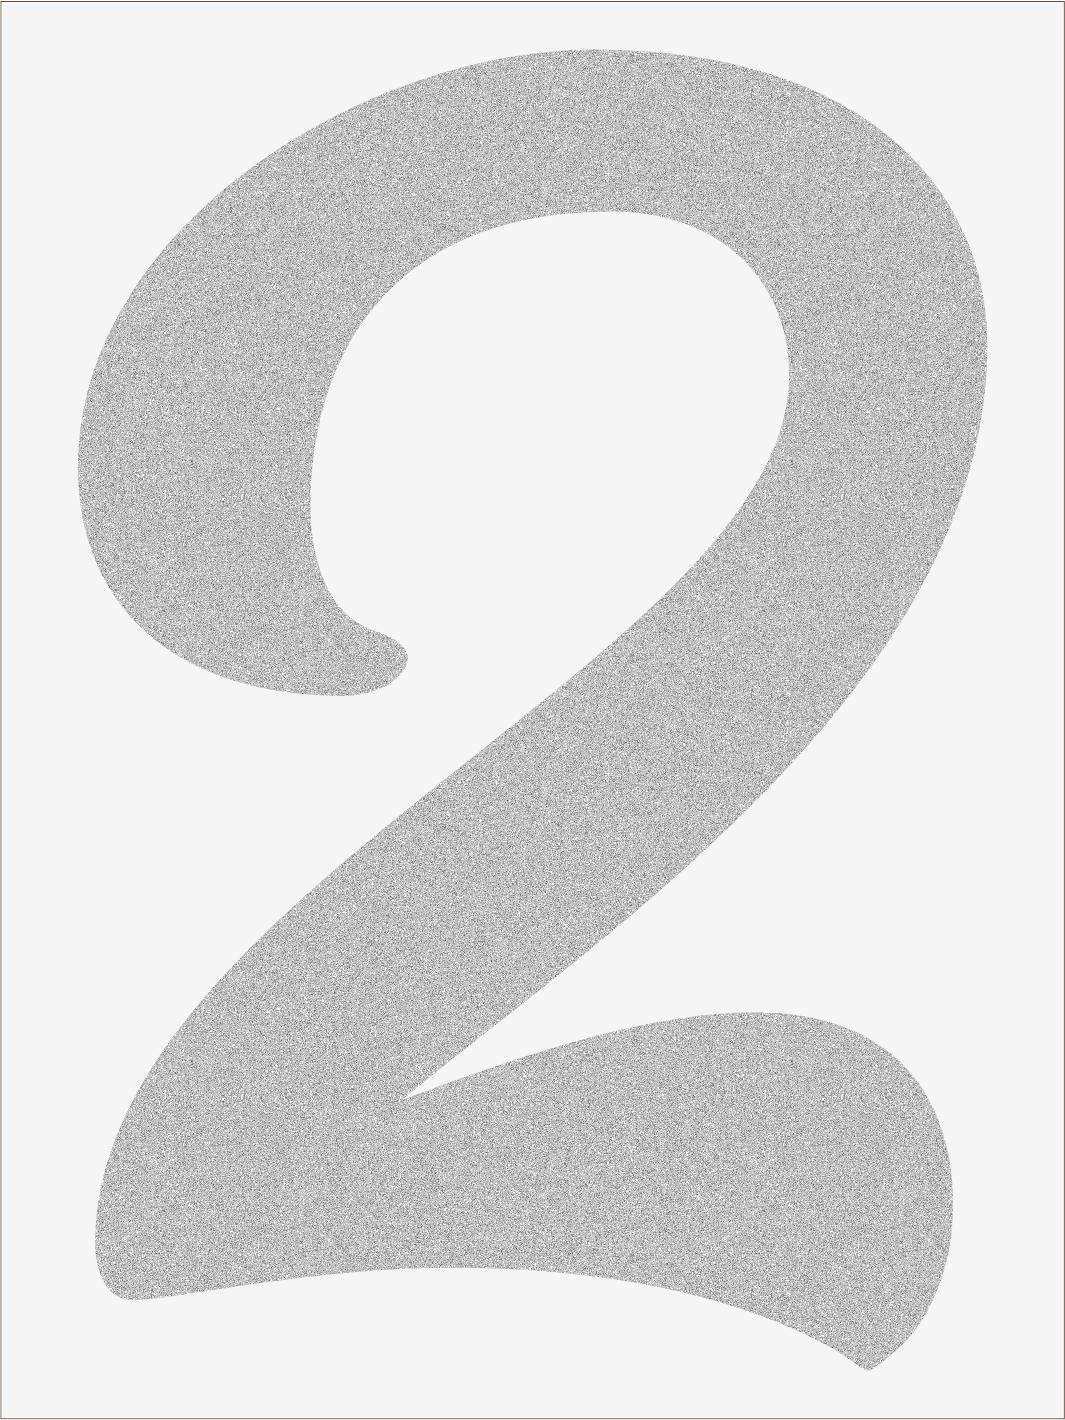 Číslica 2 font1